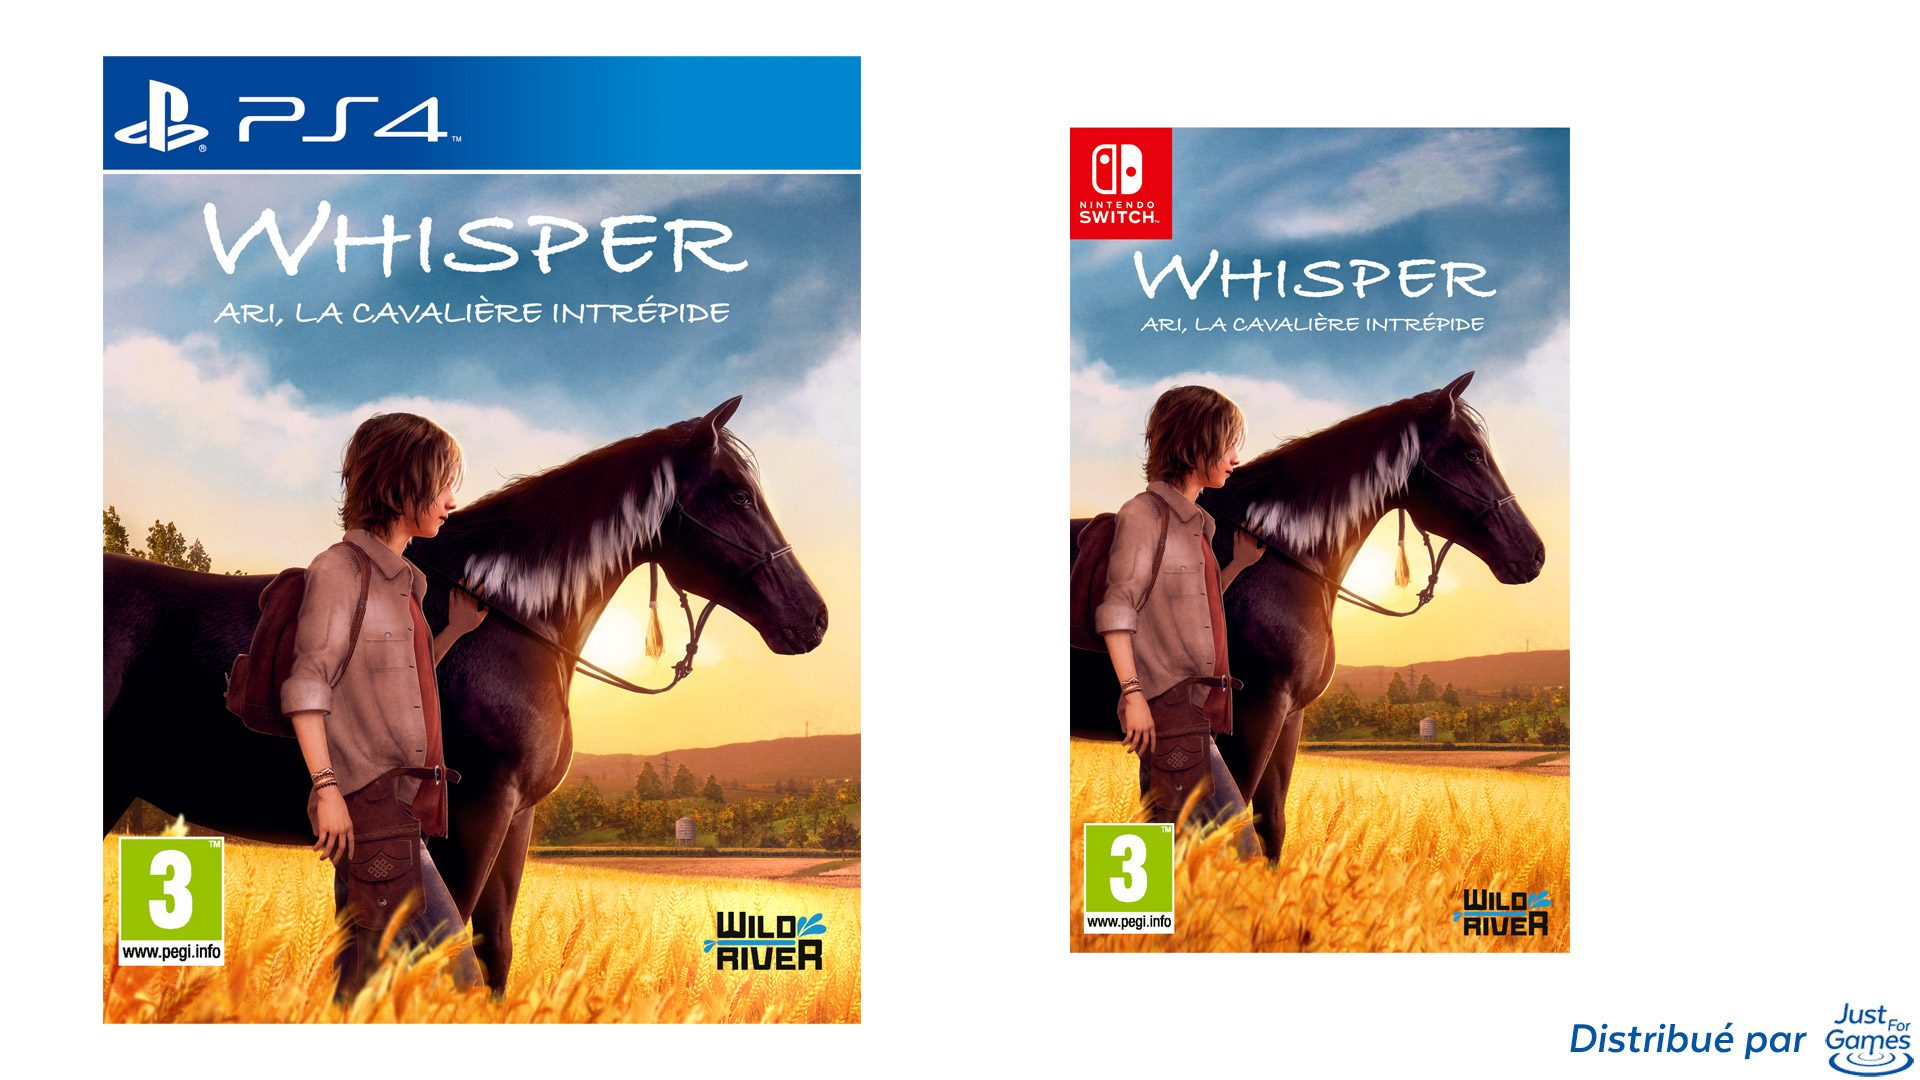 whisper_distrib